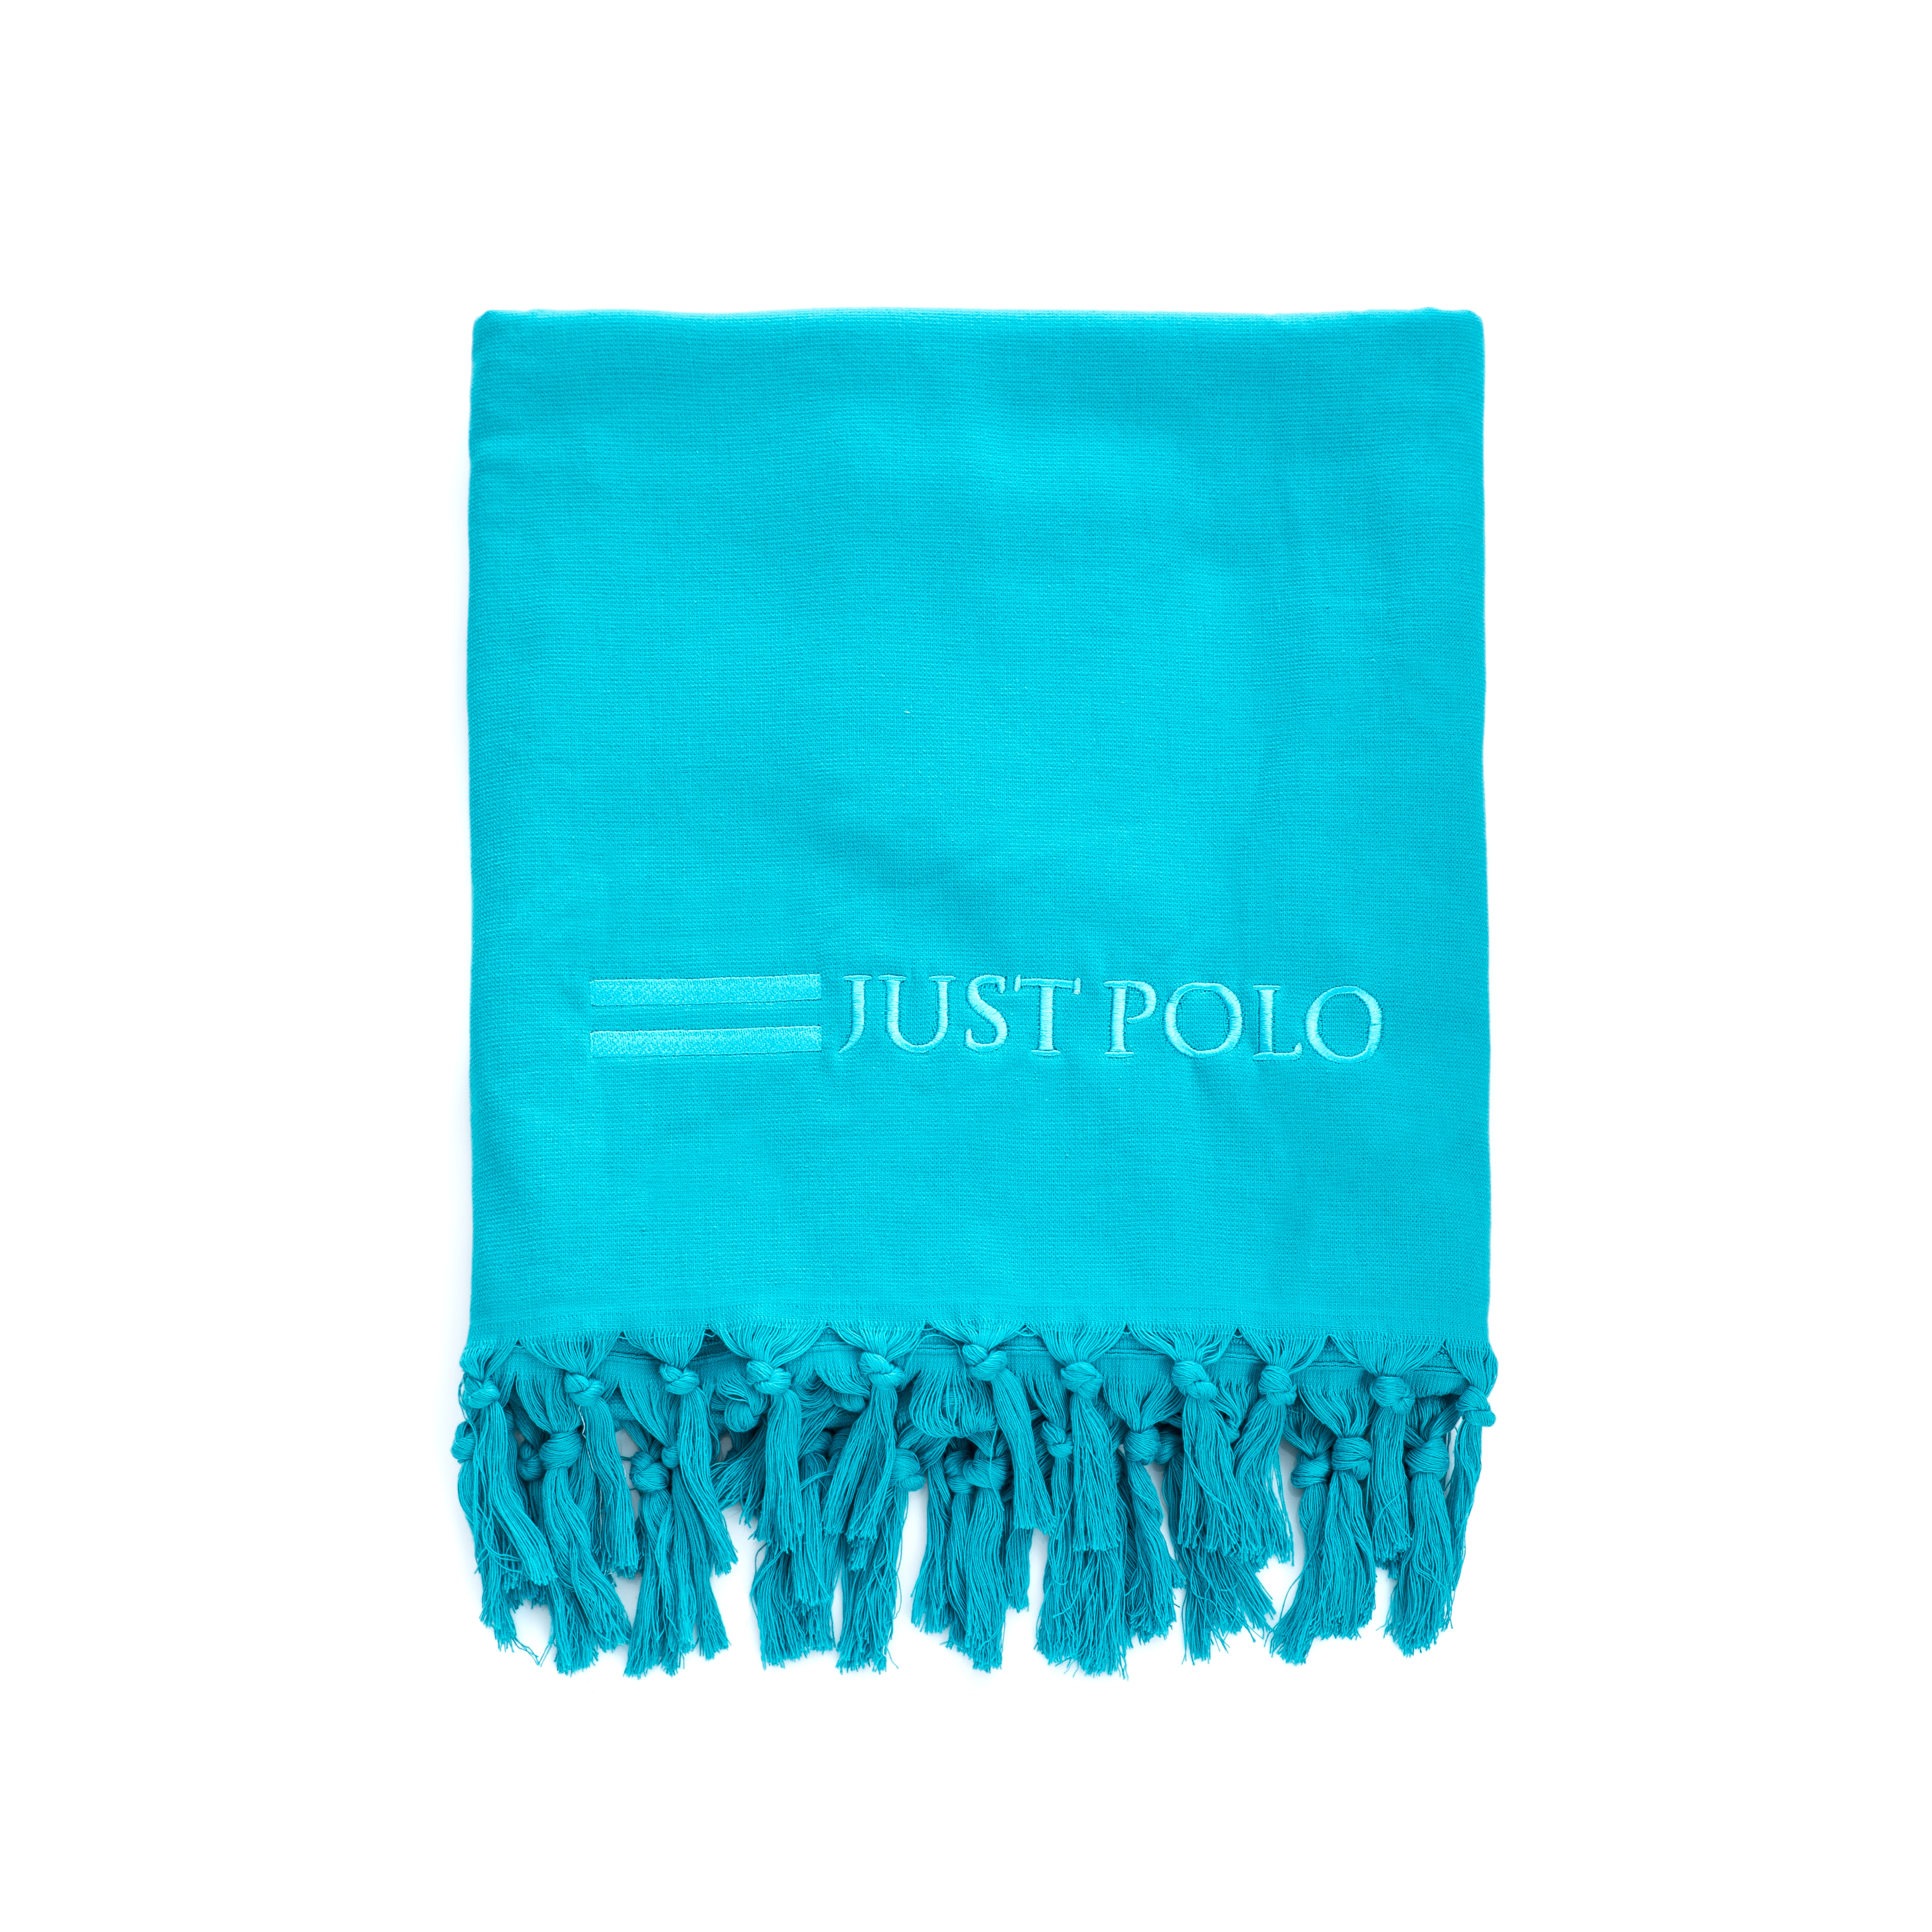 JUST POLO - Πετσέτα θαλάσσης Just Polo μπλε ανδρικά αξεσουάρ πετσέτες